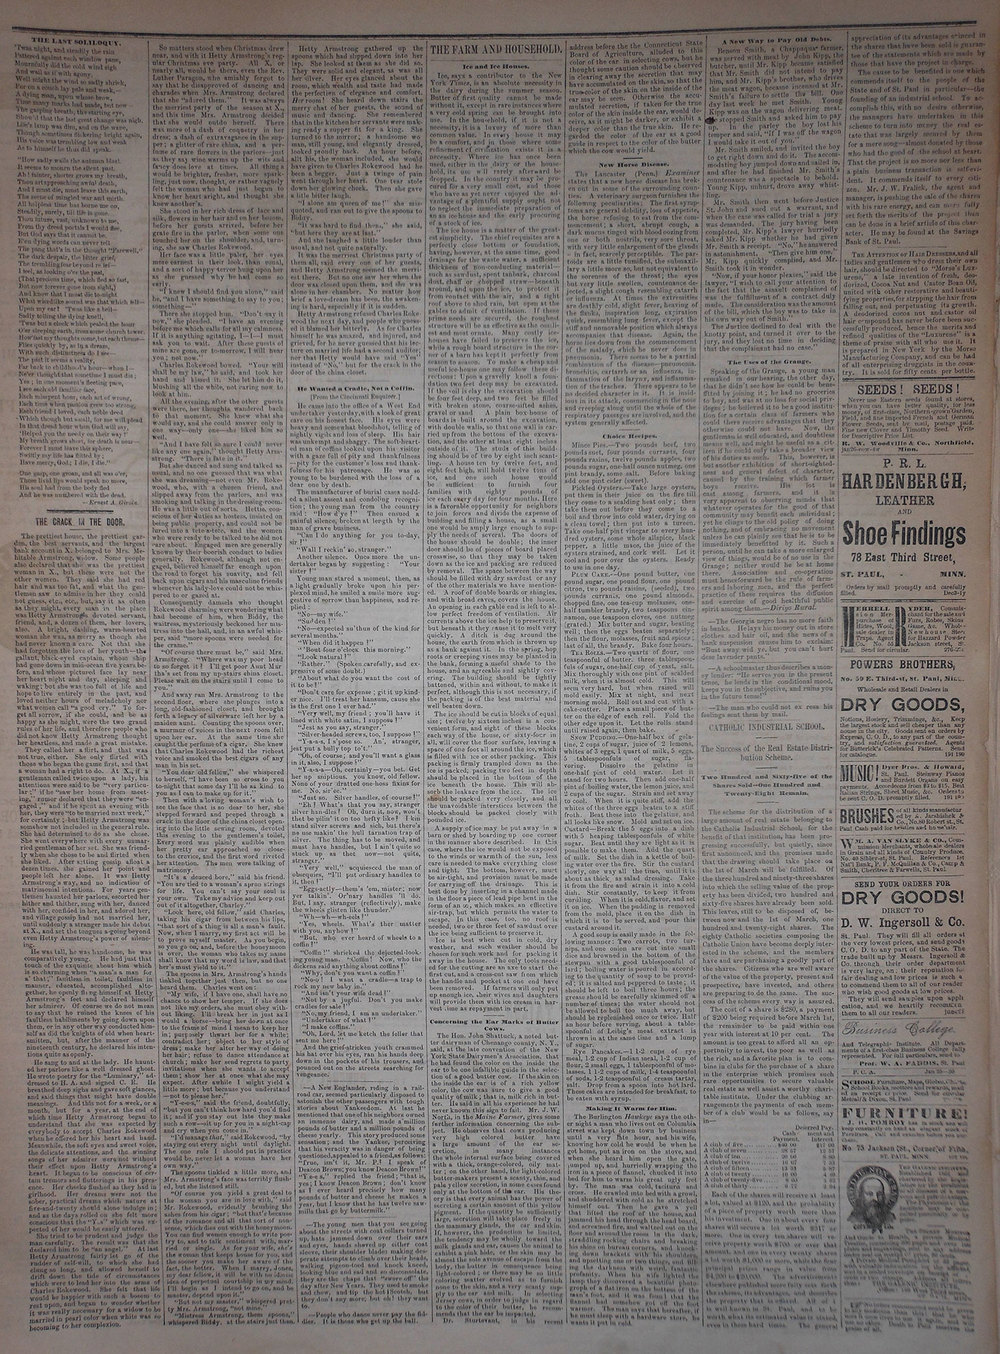 2/3/1875, p4